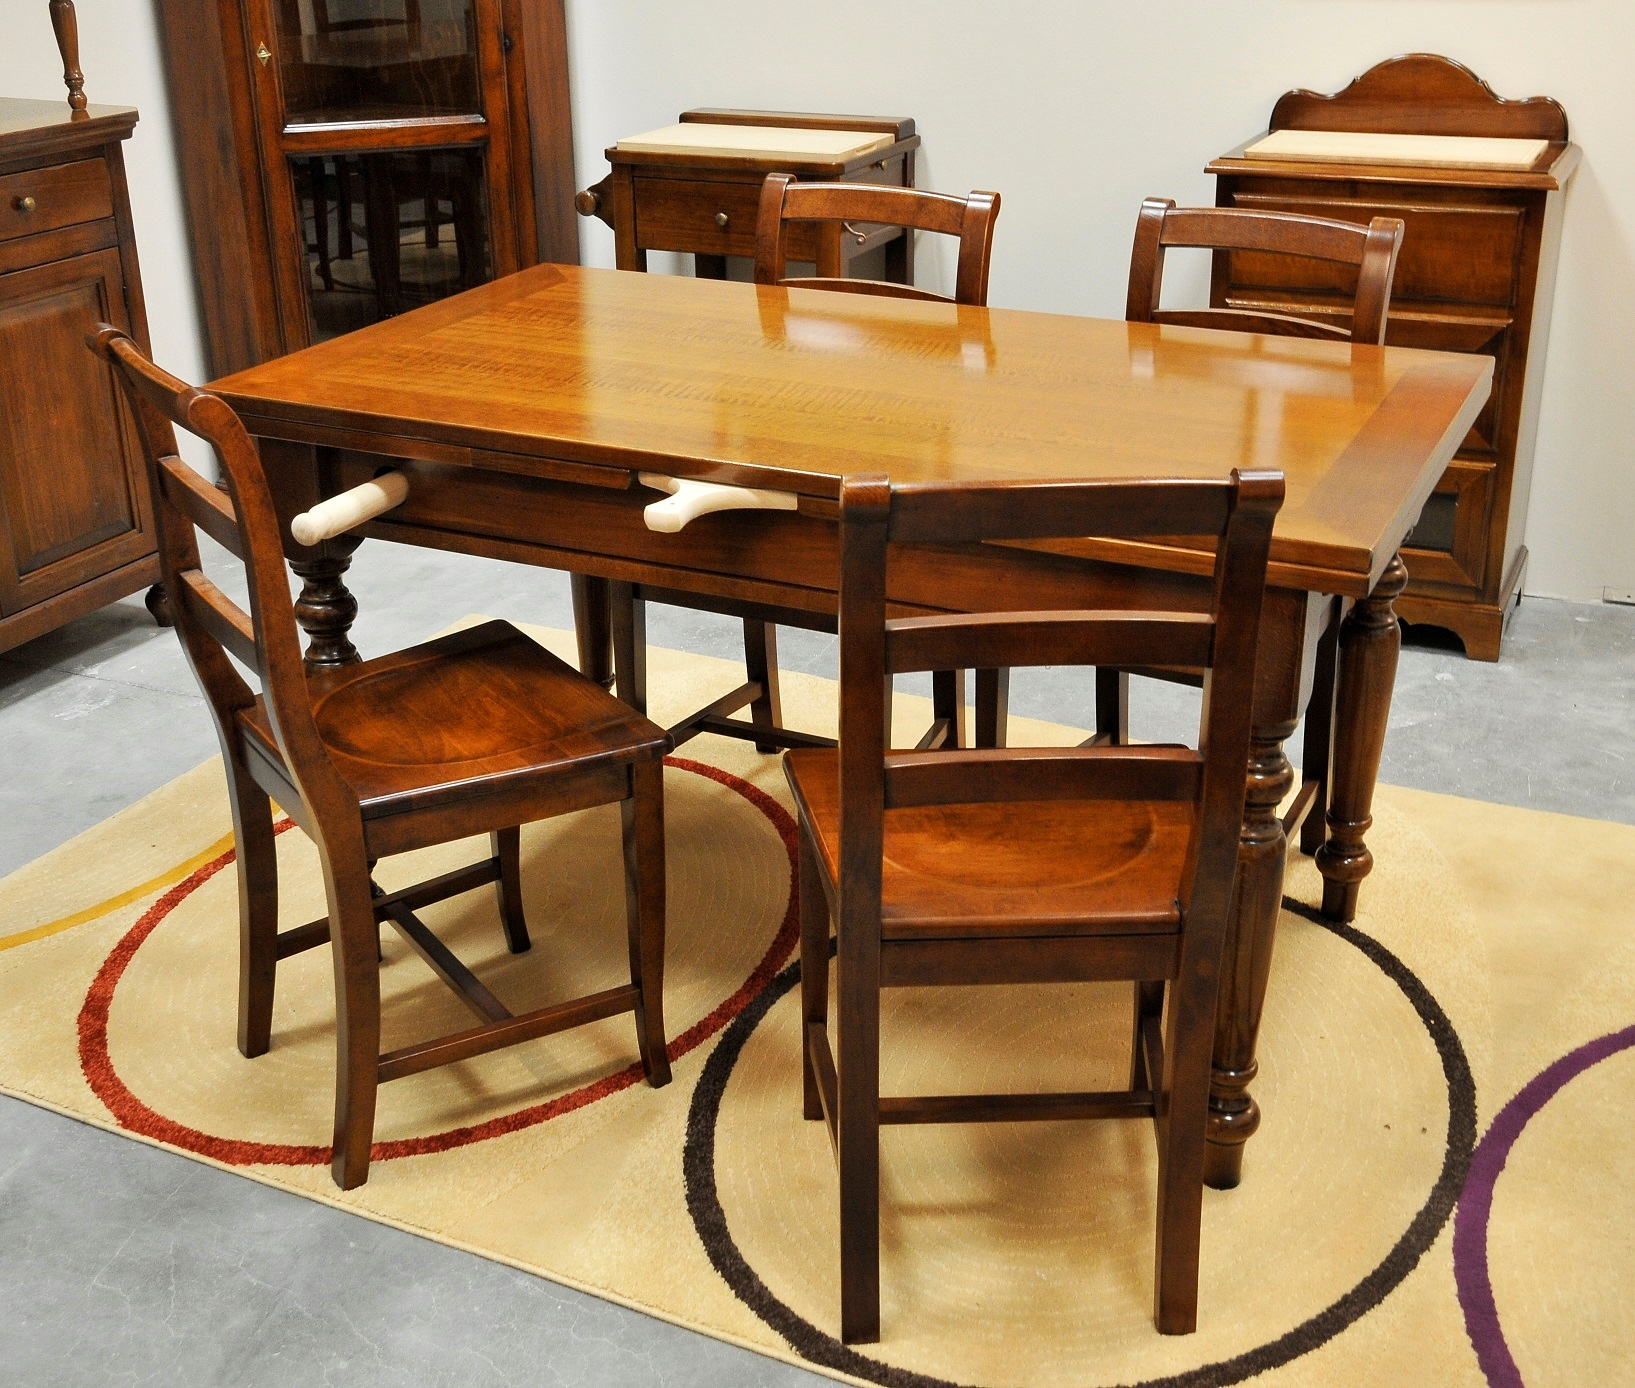 Dimensioni tavoli cucina encasa tavolo da pranzo bianco - Dimensioni tavoli da cucina ...